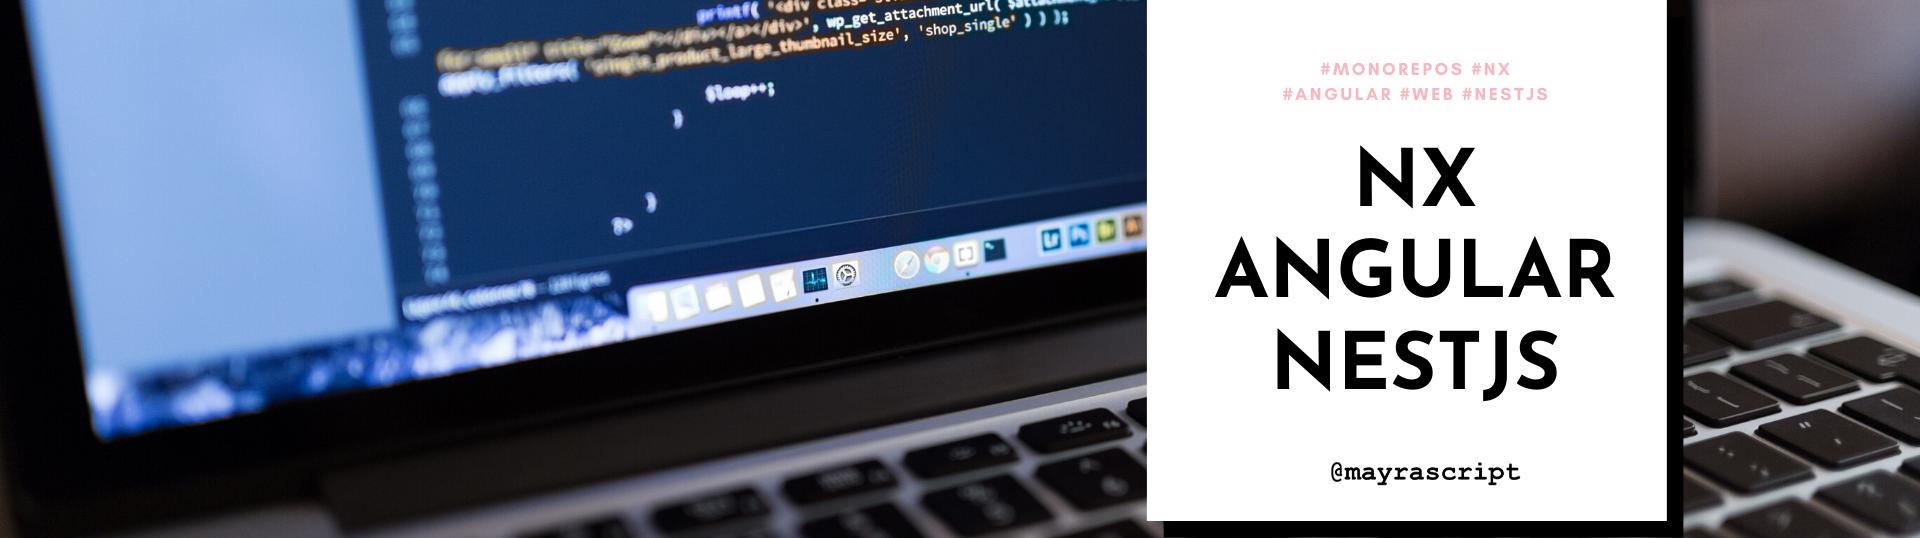 Nx + Angular + NestJS (Cover Image)